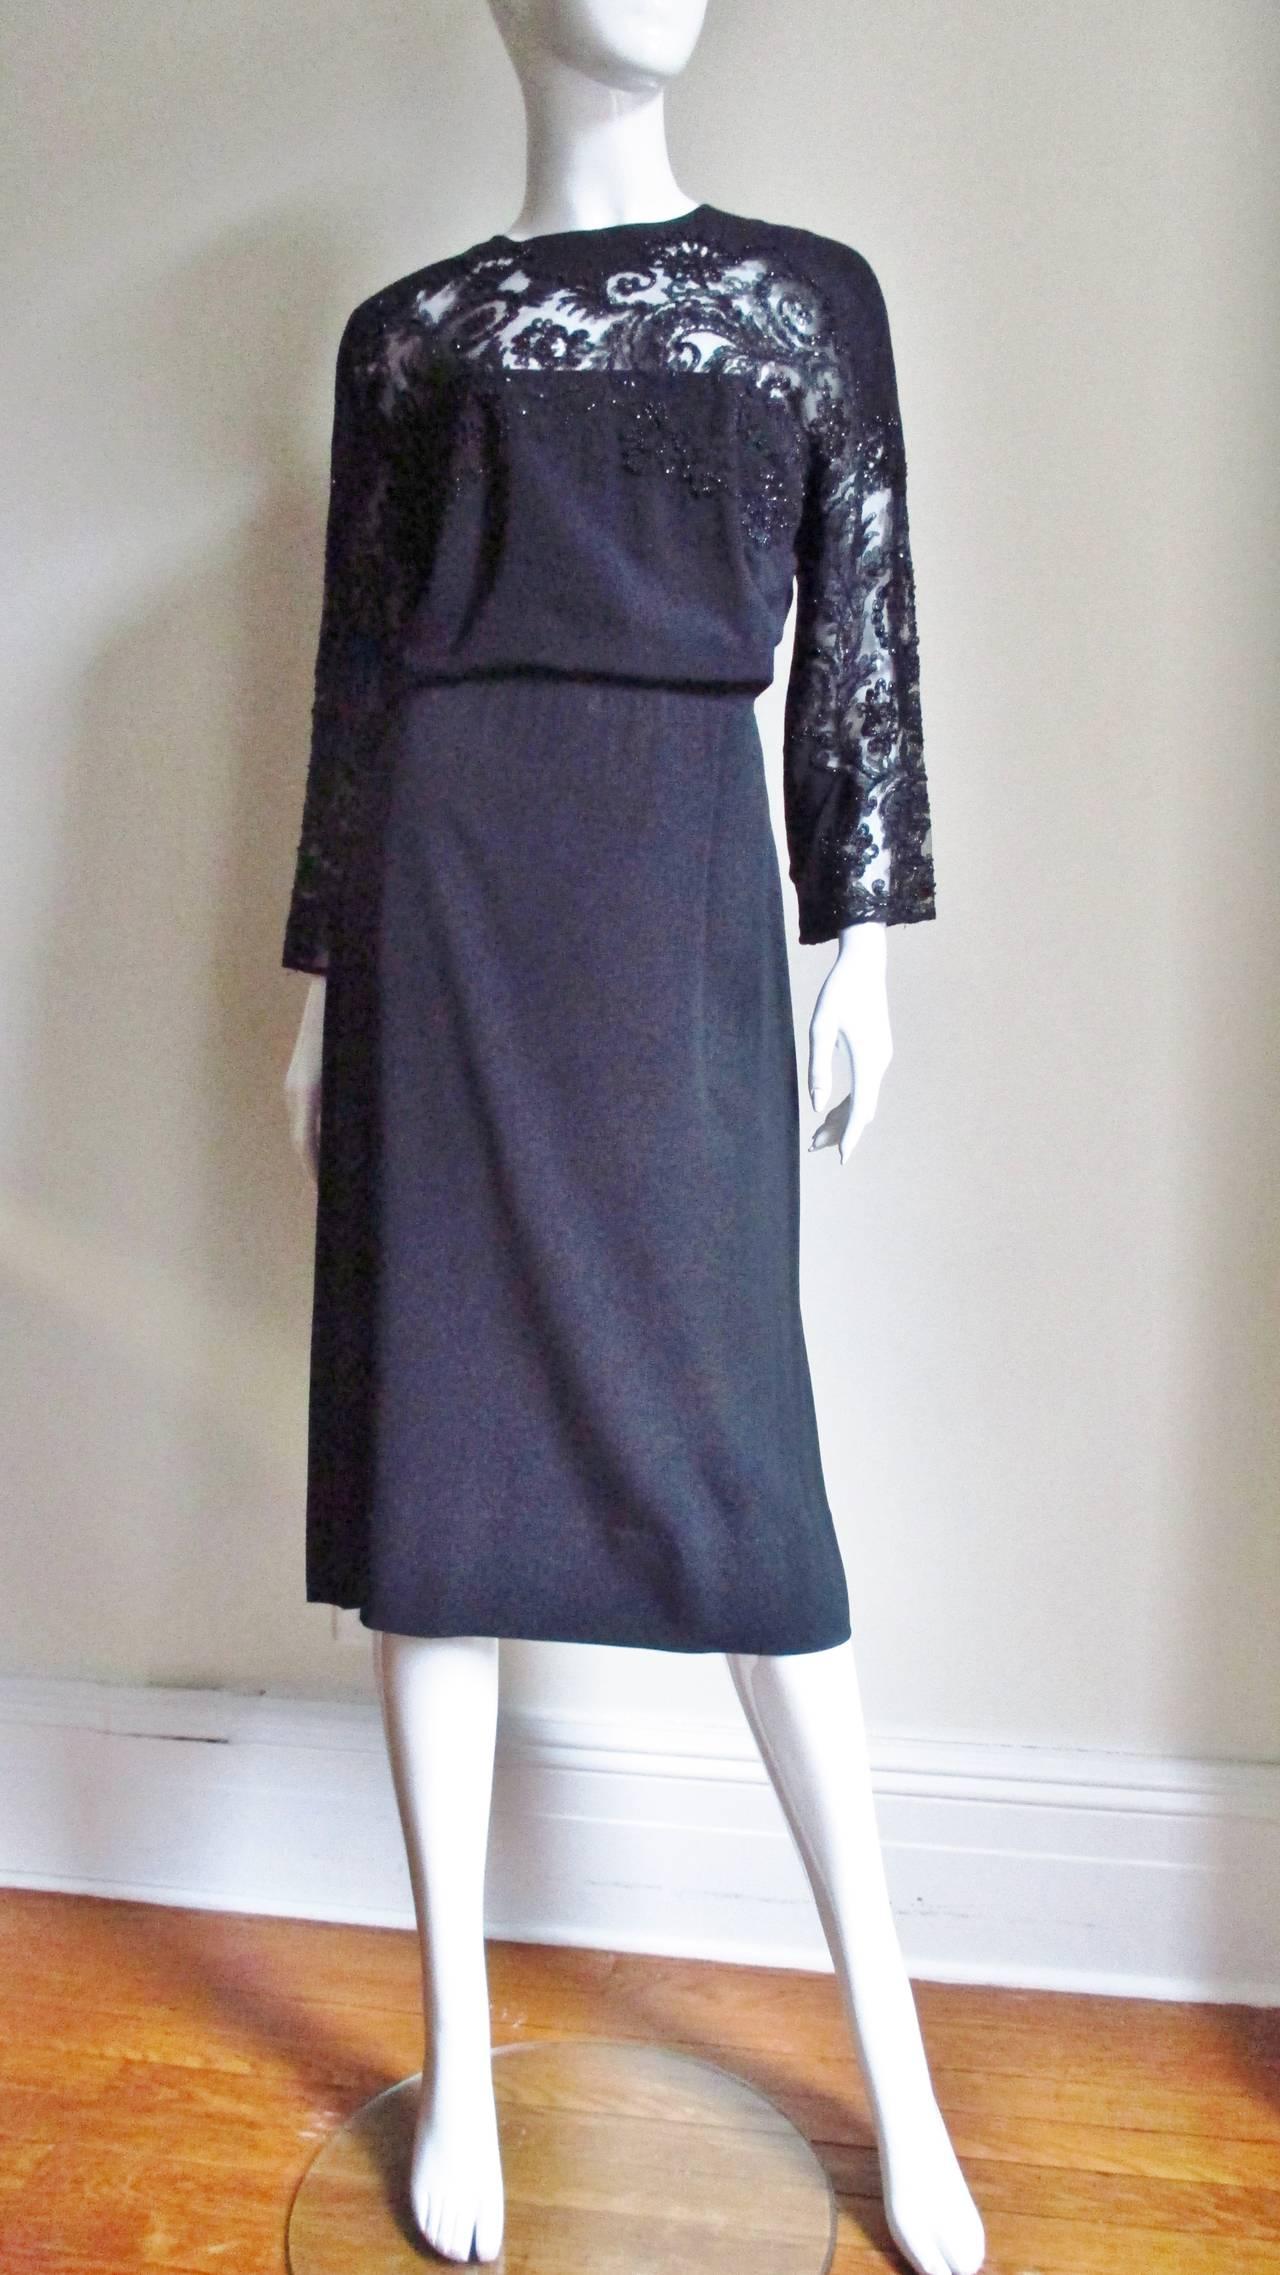 Eisenberg Originals Beaded Lace Panel Dress 1940s For Sale 5